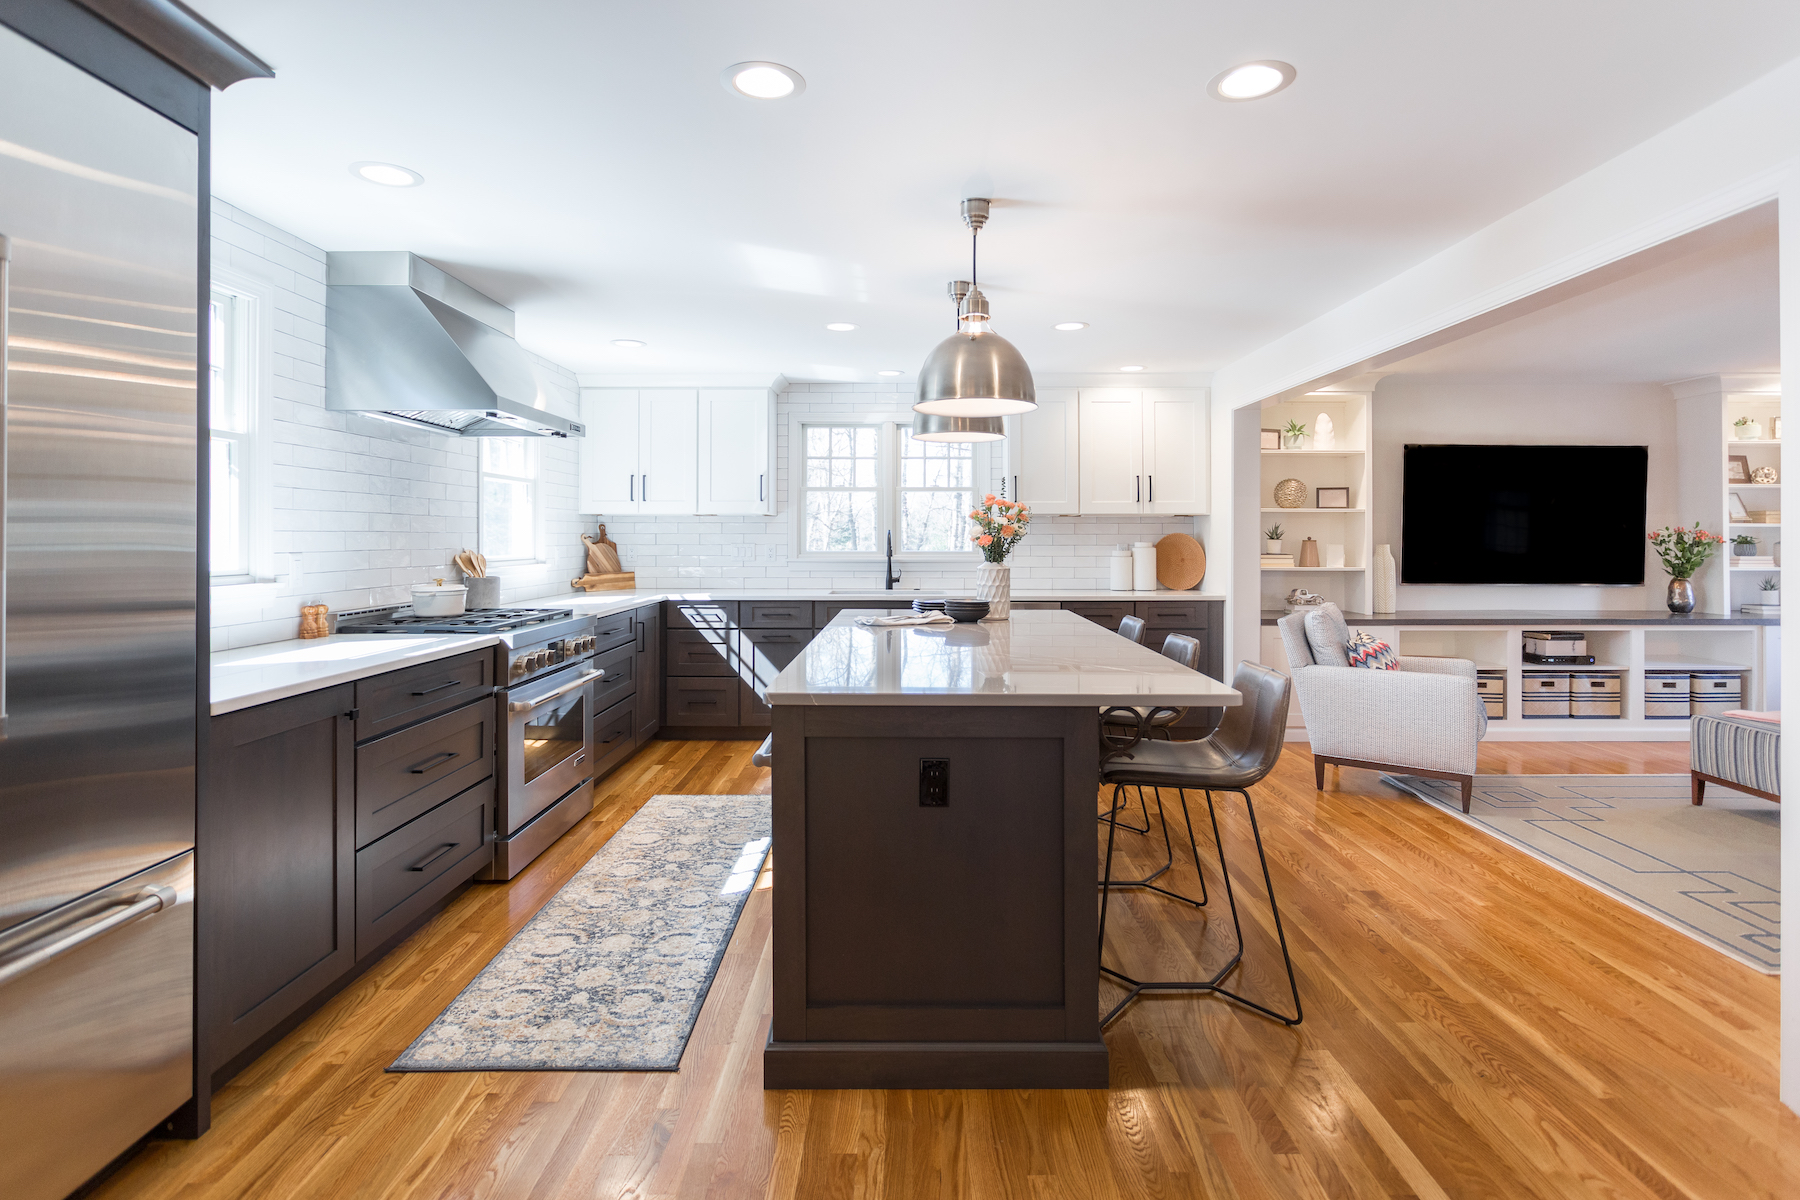 Custom Hardwood Floors And Countertop